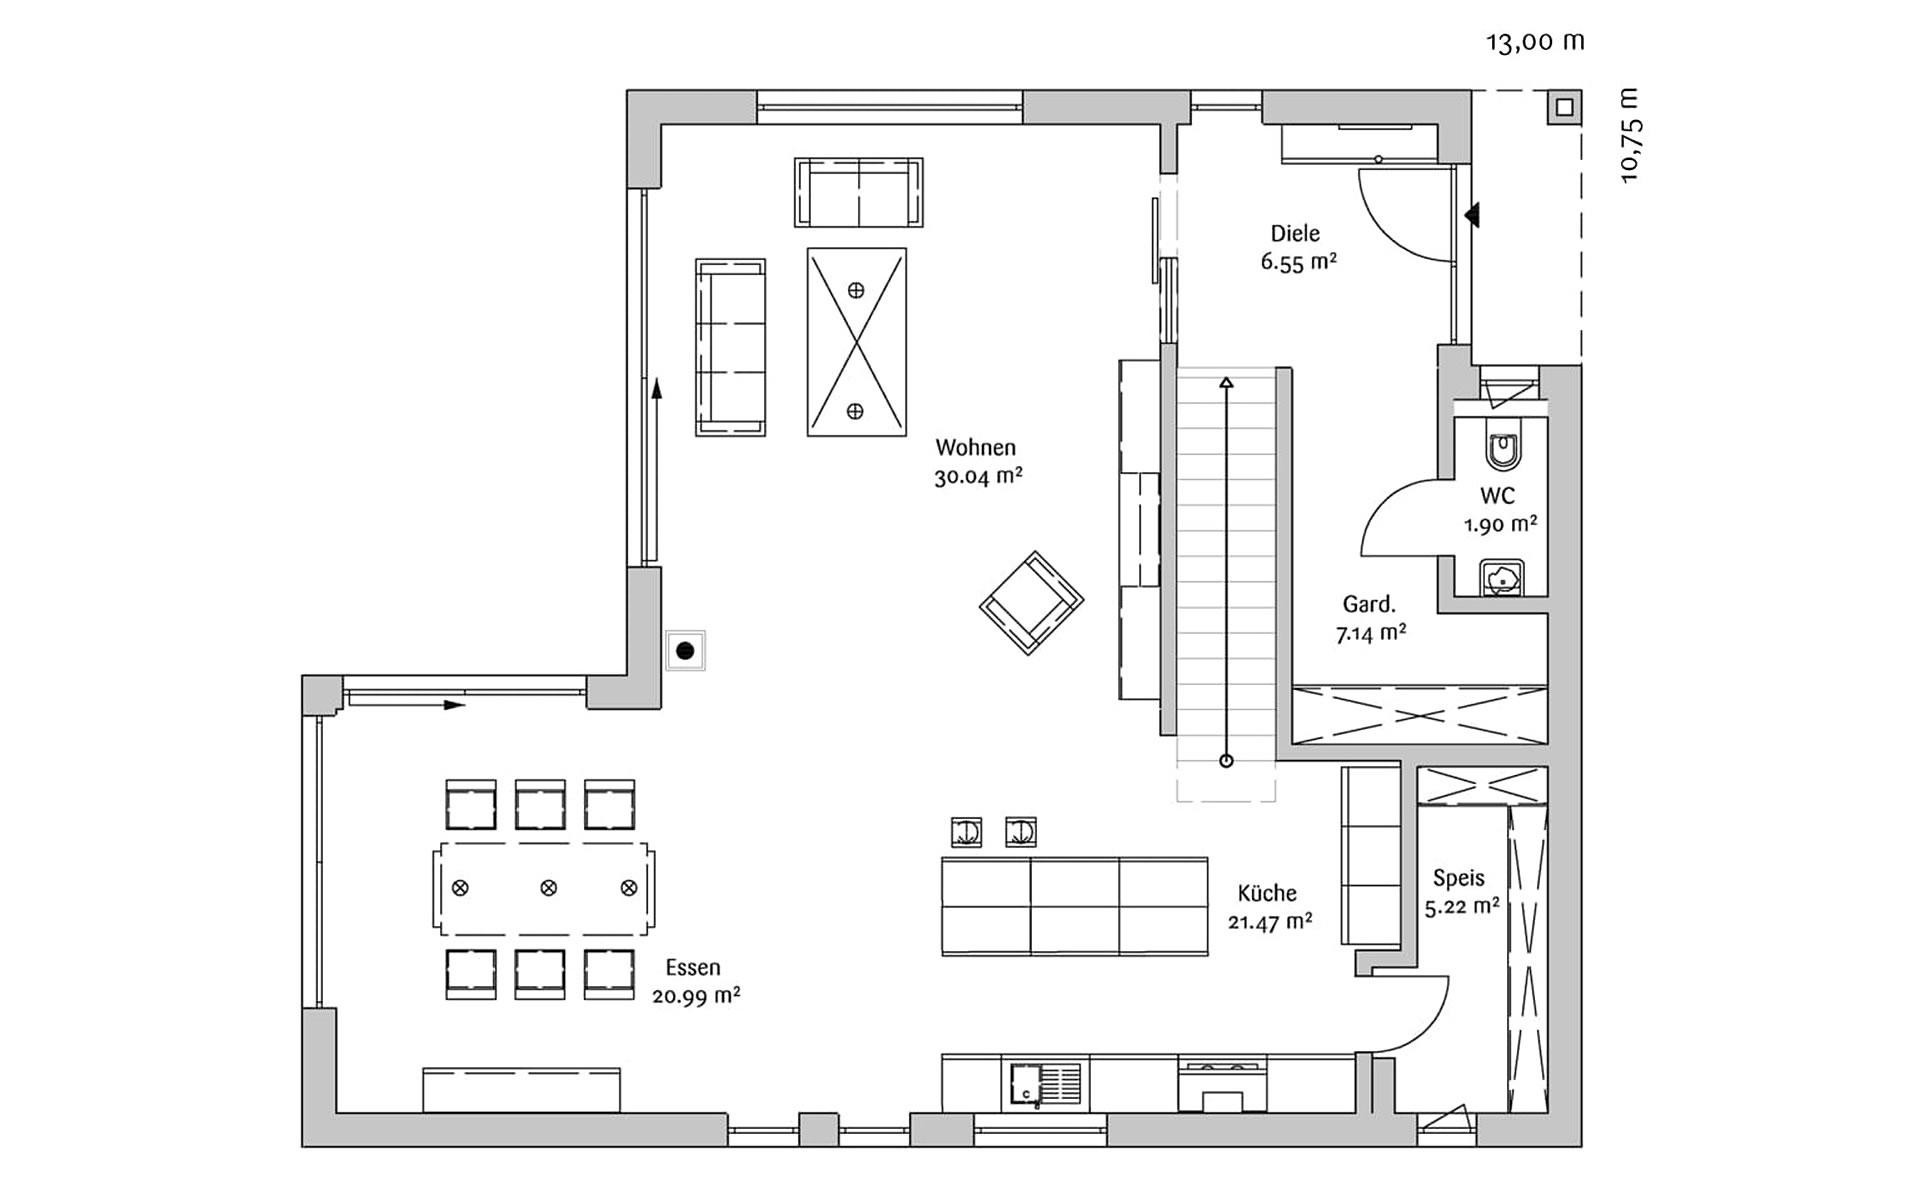 Erdgeschoss Bauhaus 190 von FischerHaus GmbH & Co. KG